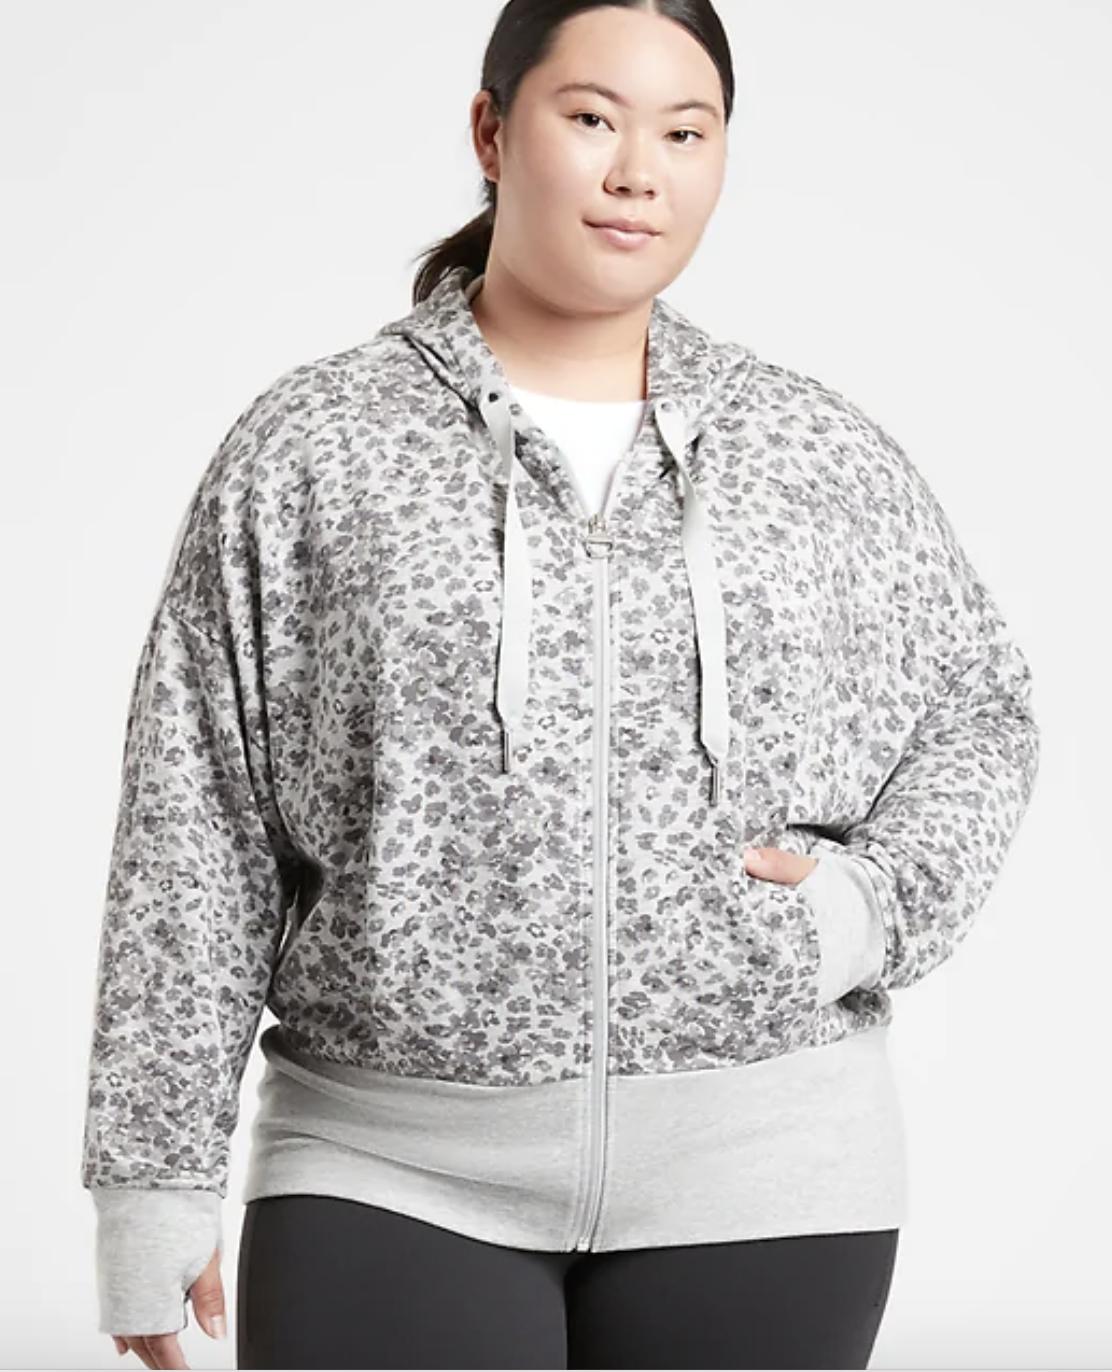 a plus size model wears the balance printed sweatshirt